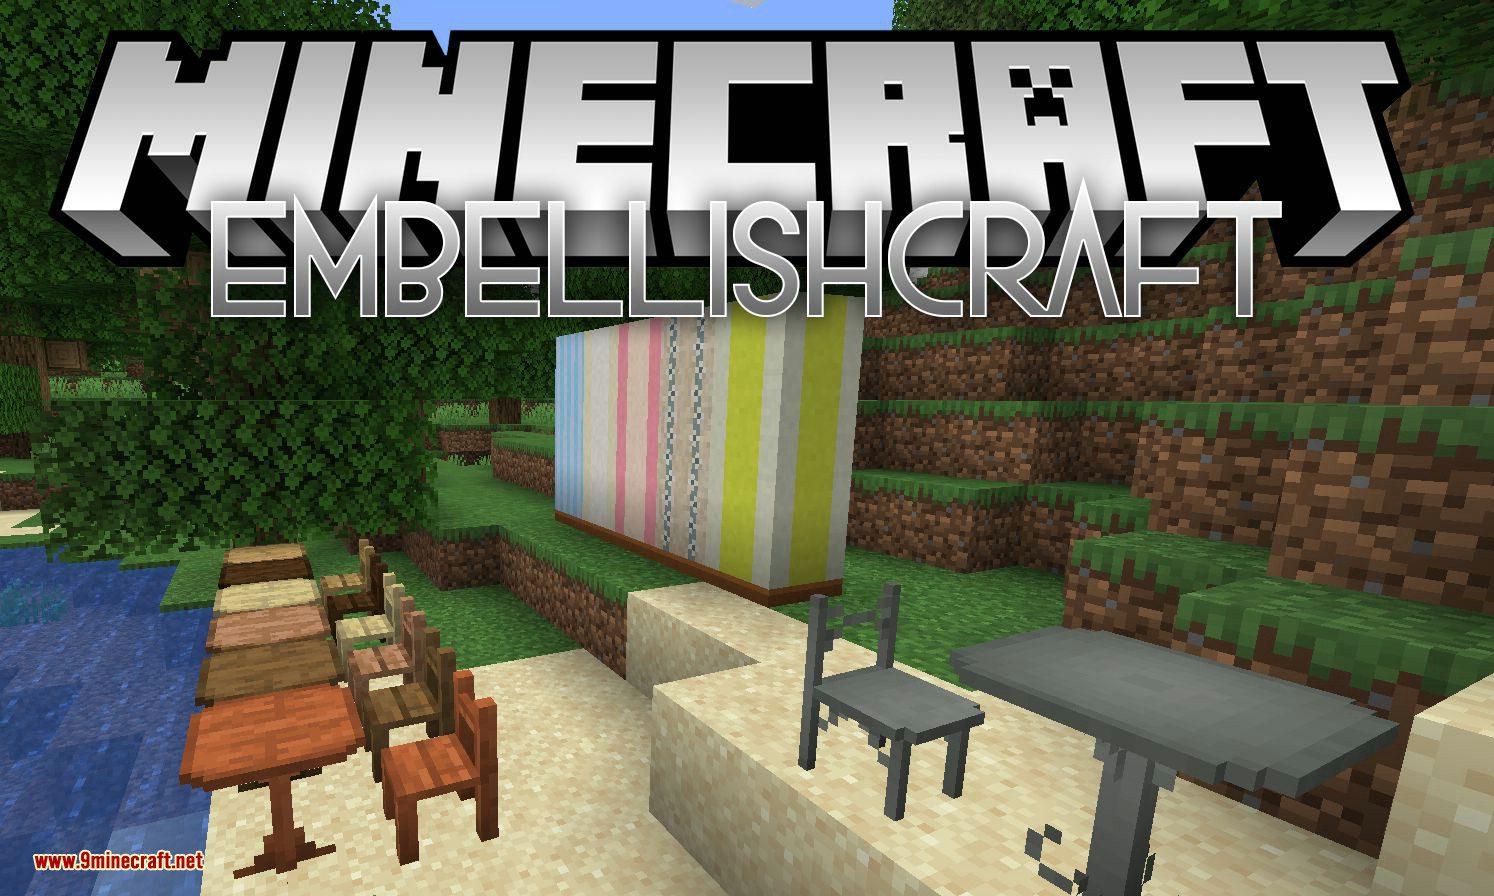 EmbellishCraft Mod 9.96.9/9.95.9 (A Mod About Decoration